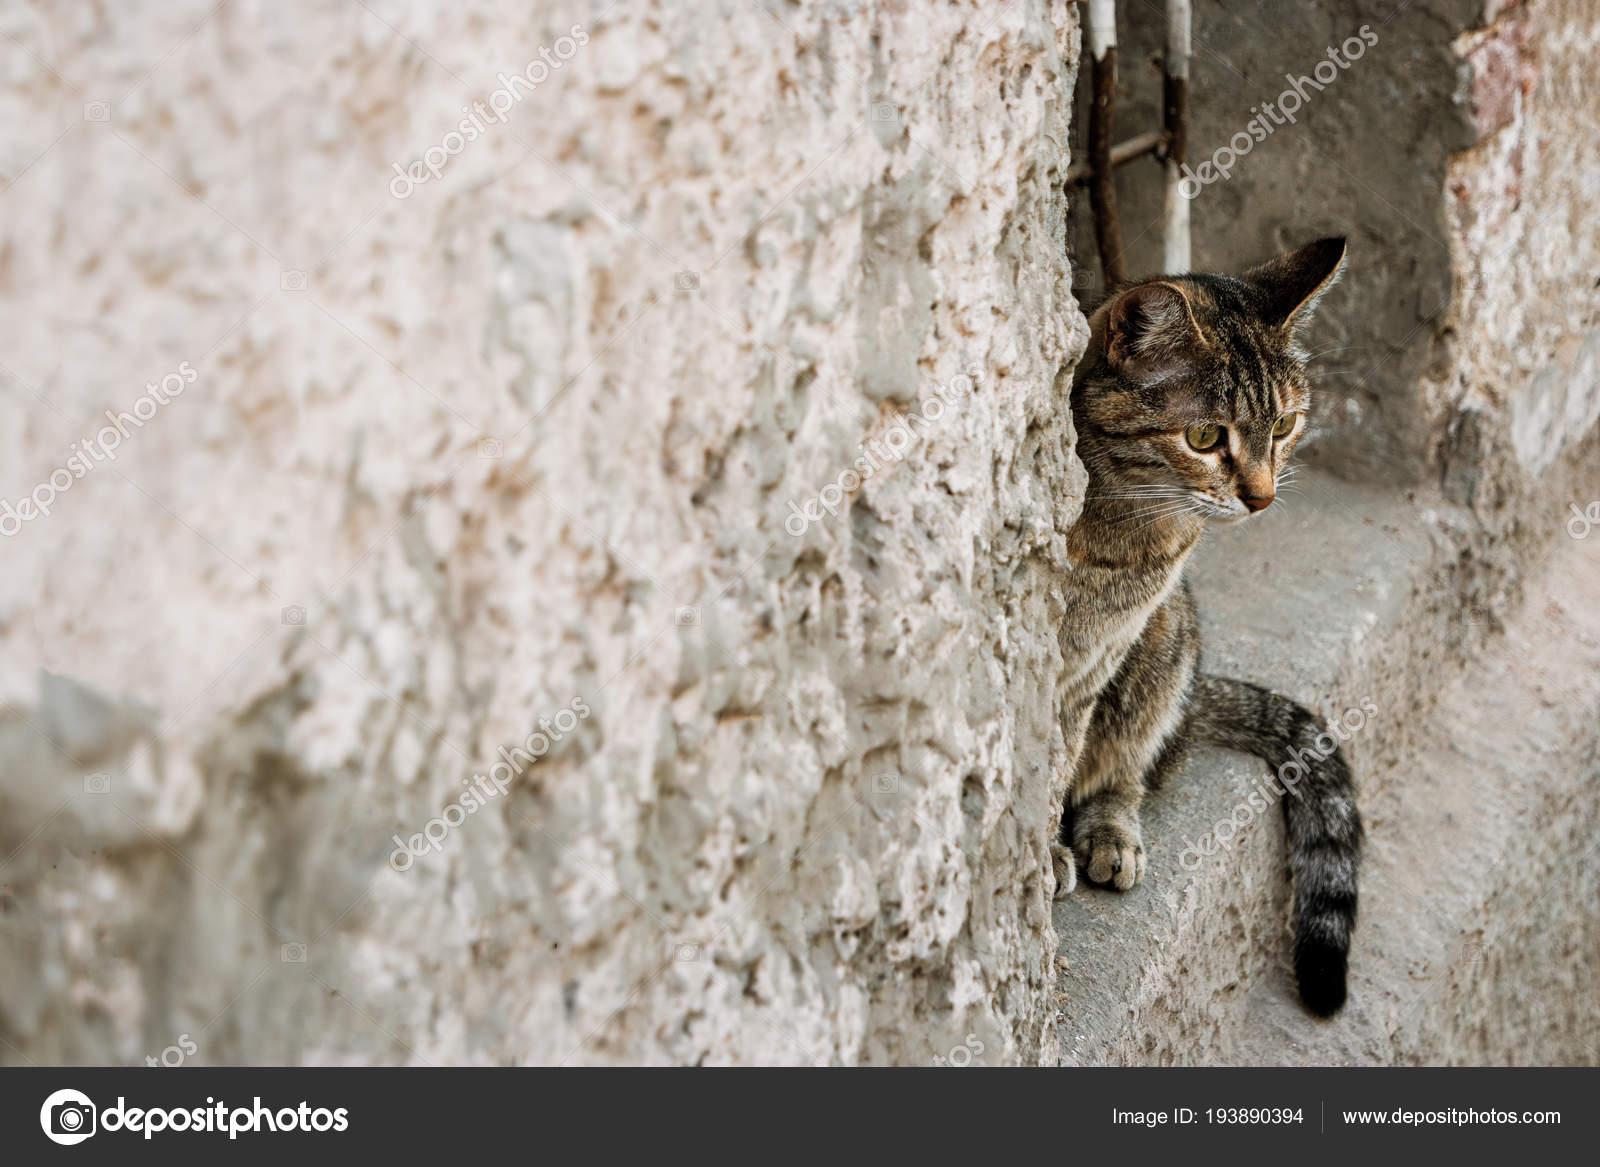 Calico cat peeking out of a window opening — Stock Photo